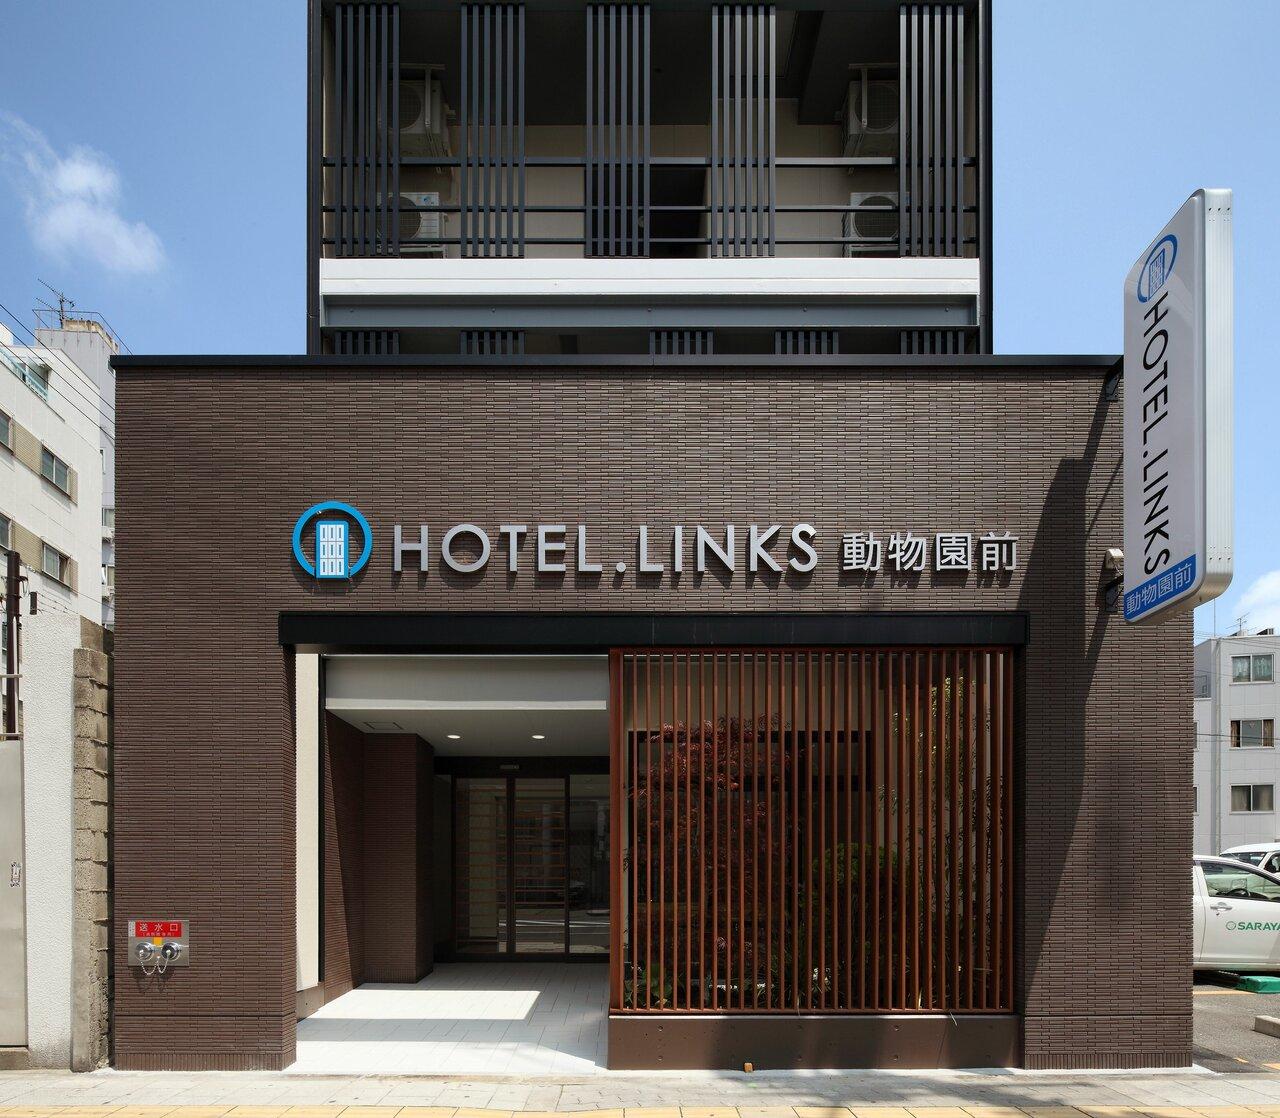 Hotel.links Dobutsuen-mae